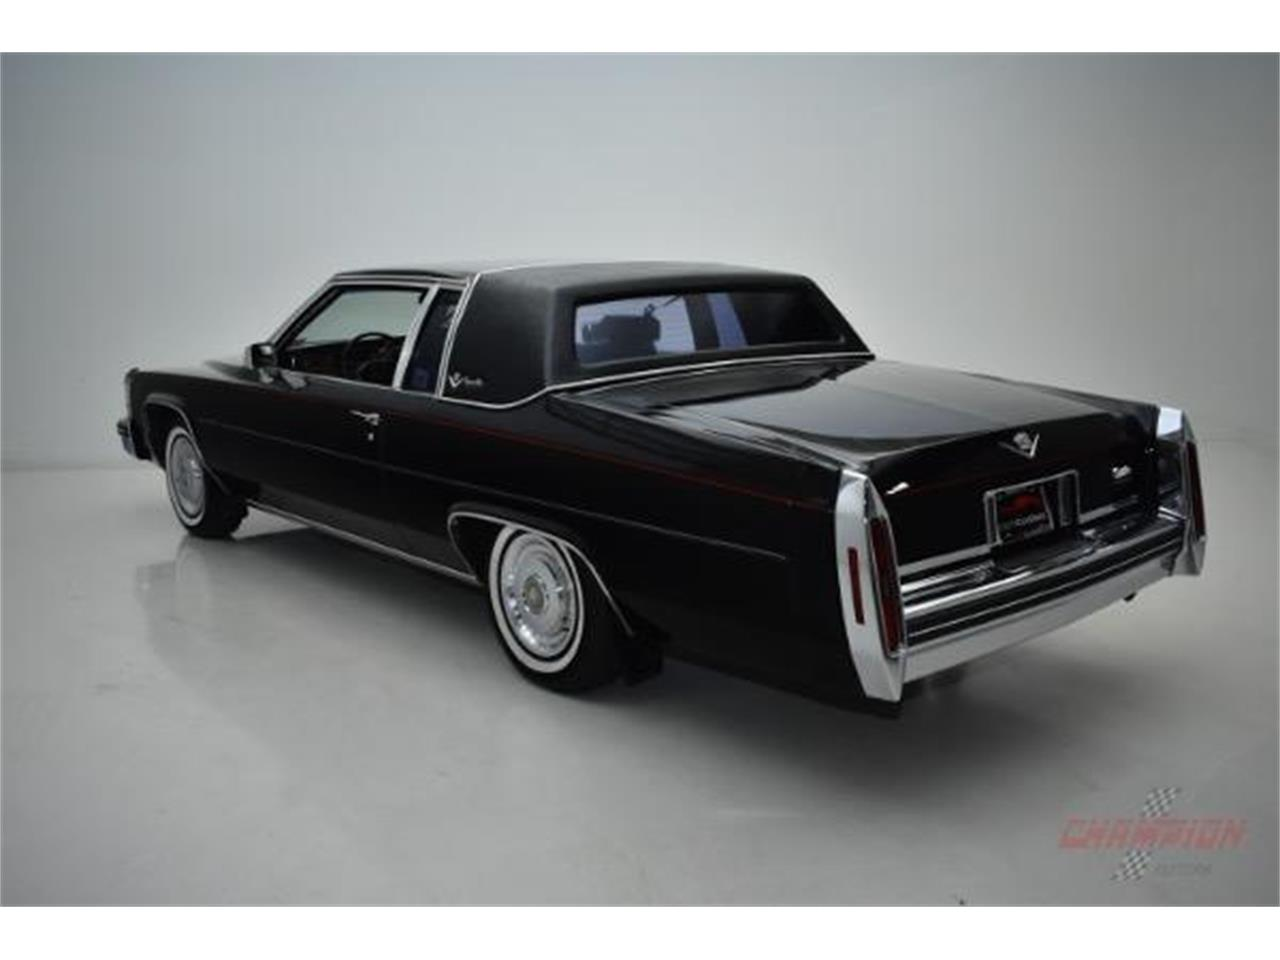 1984 Cadillac Coupe DeVille for Sale | ClassicCars.com